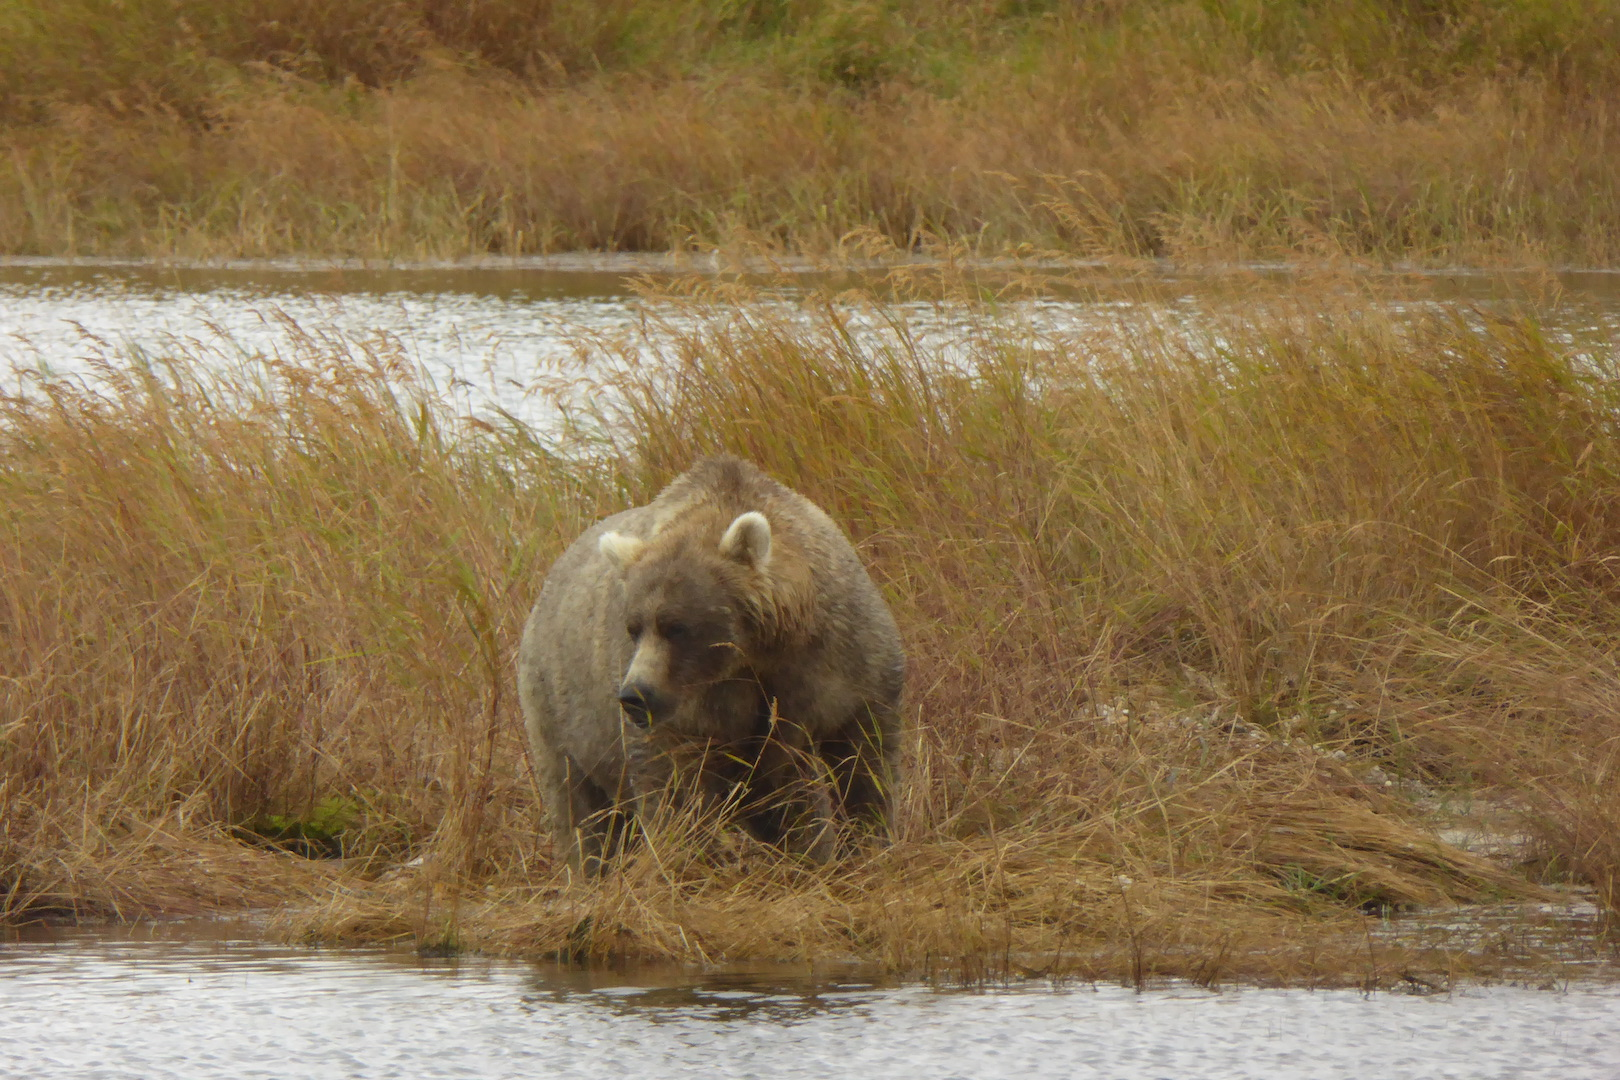 brown bear standing in grass near water